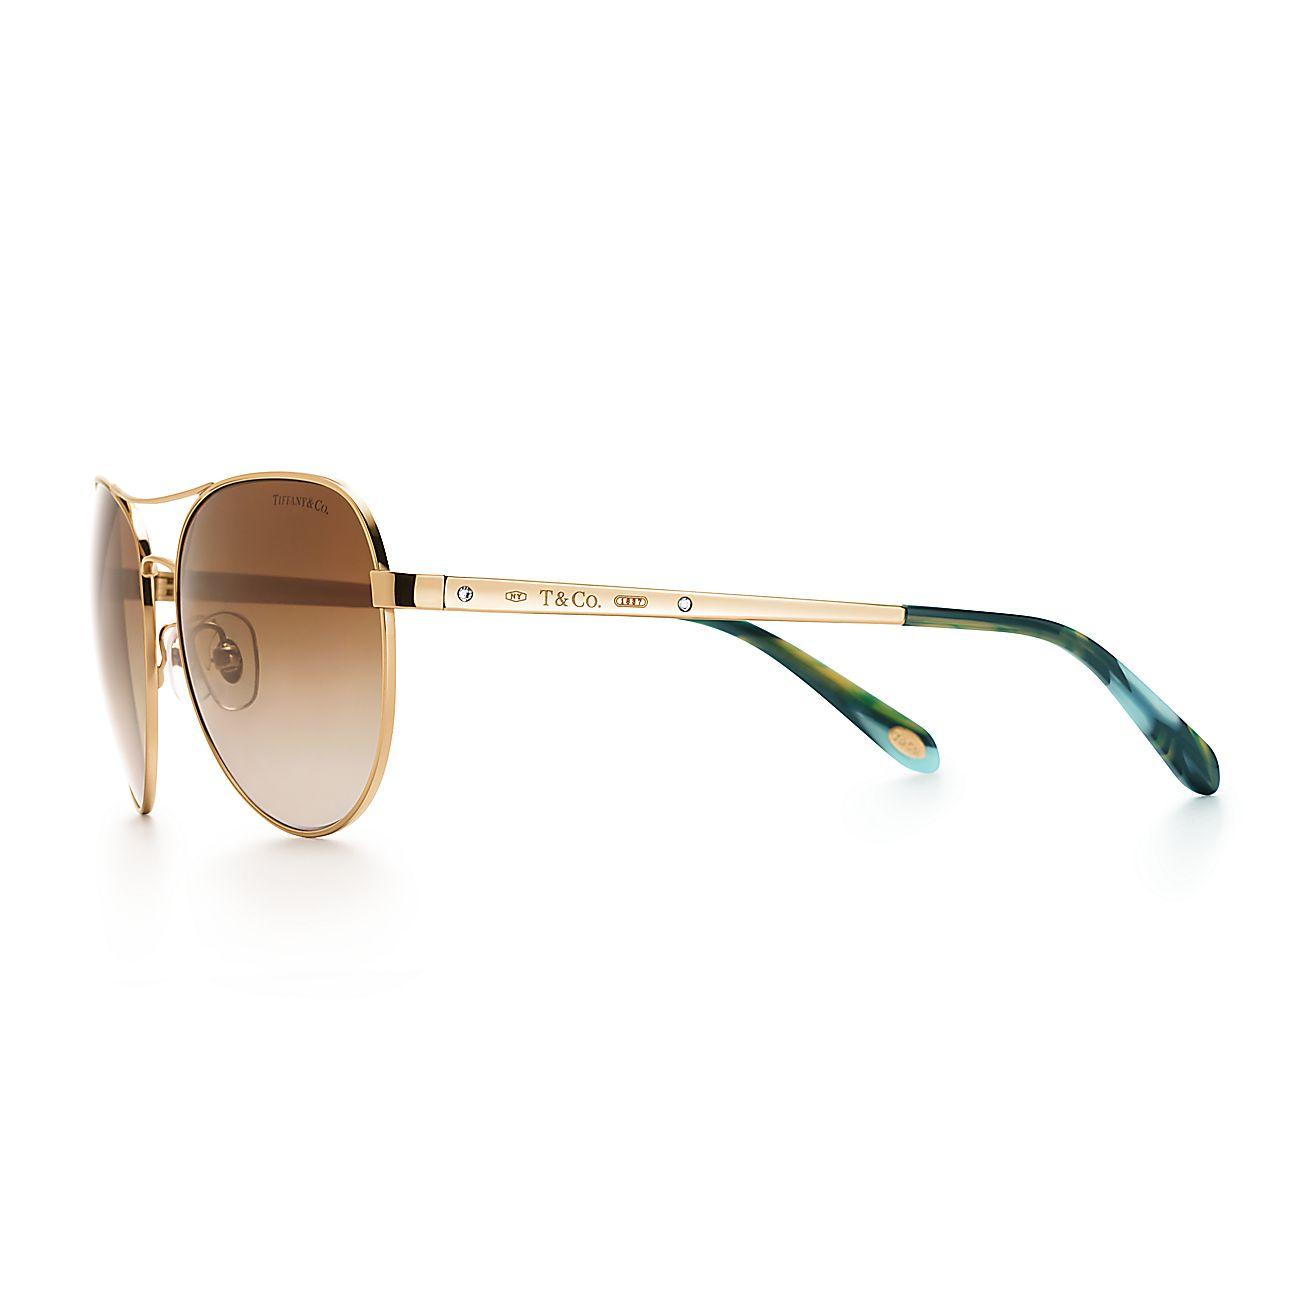 bac728c46578 Tiffany Locks Aviator Sunglasses Gold